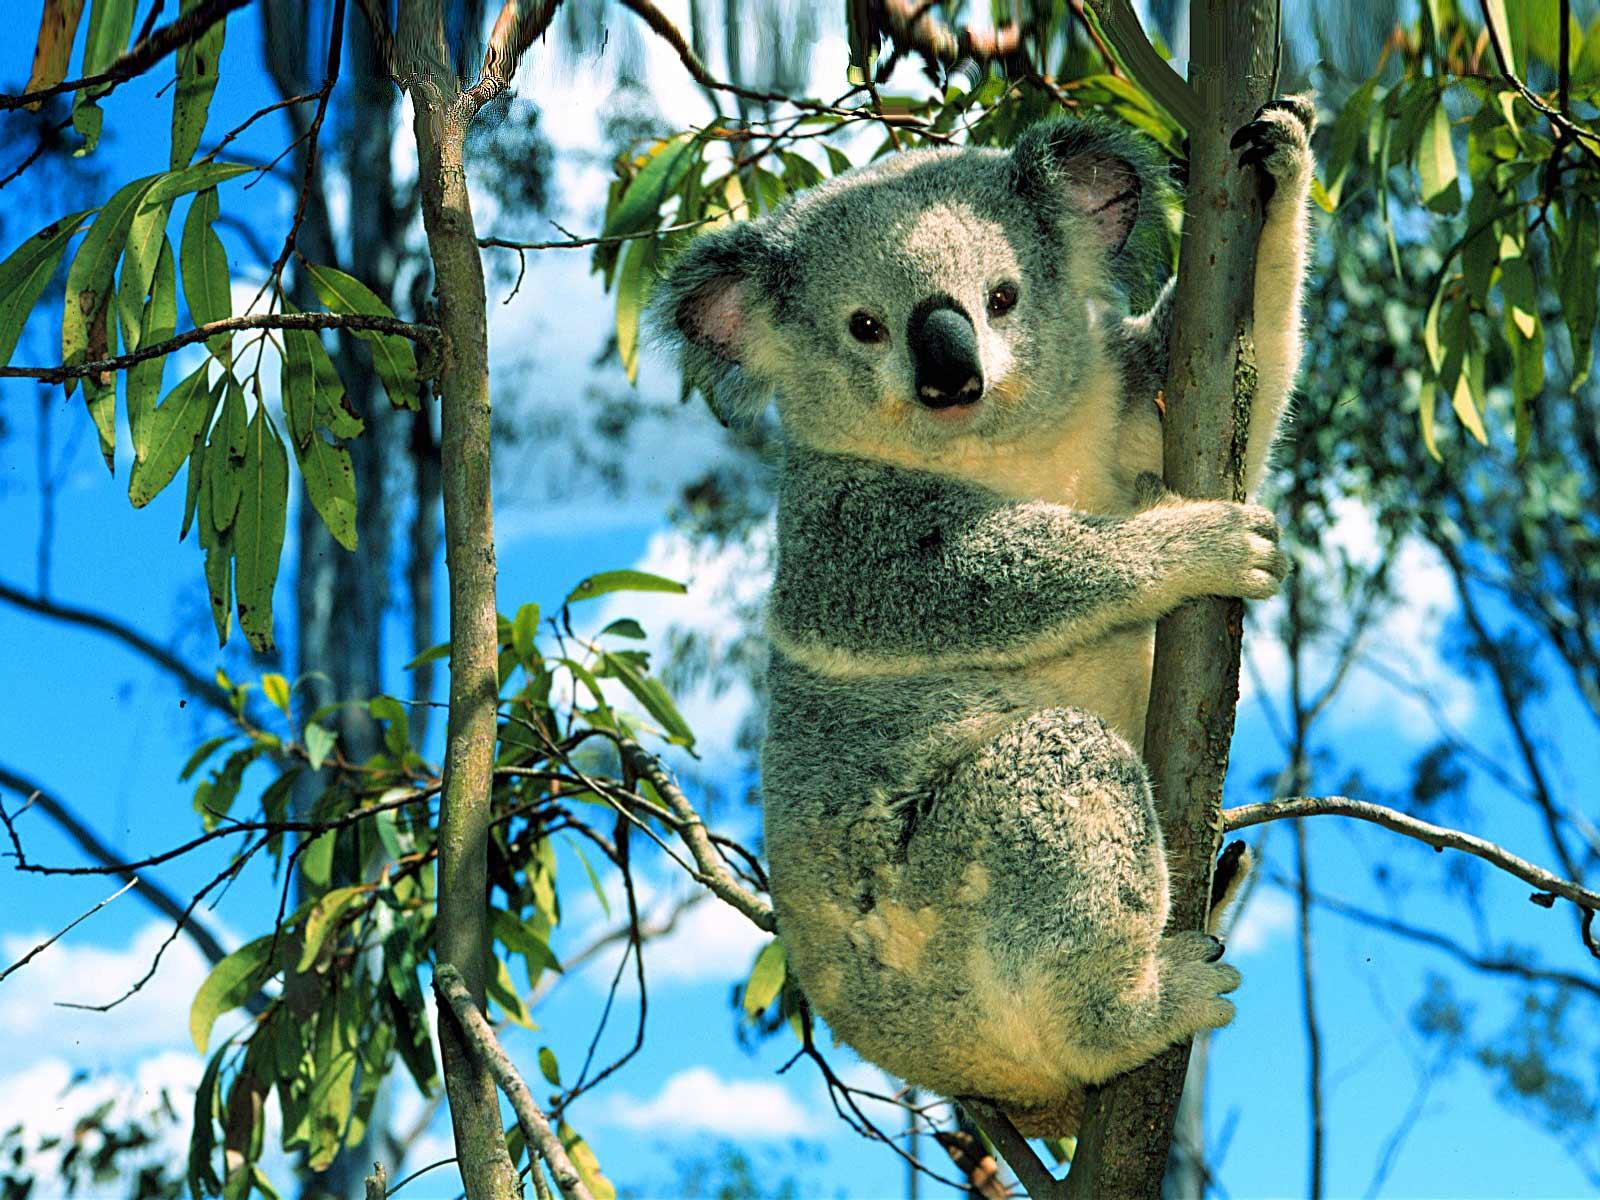 фото коалы на дереве